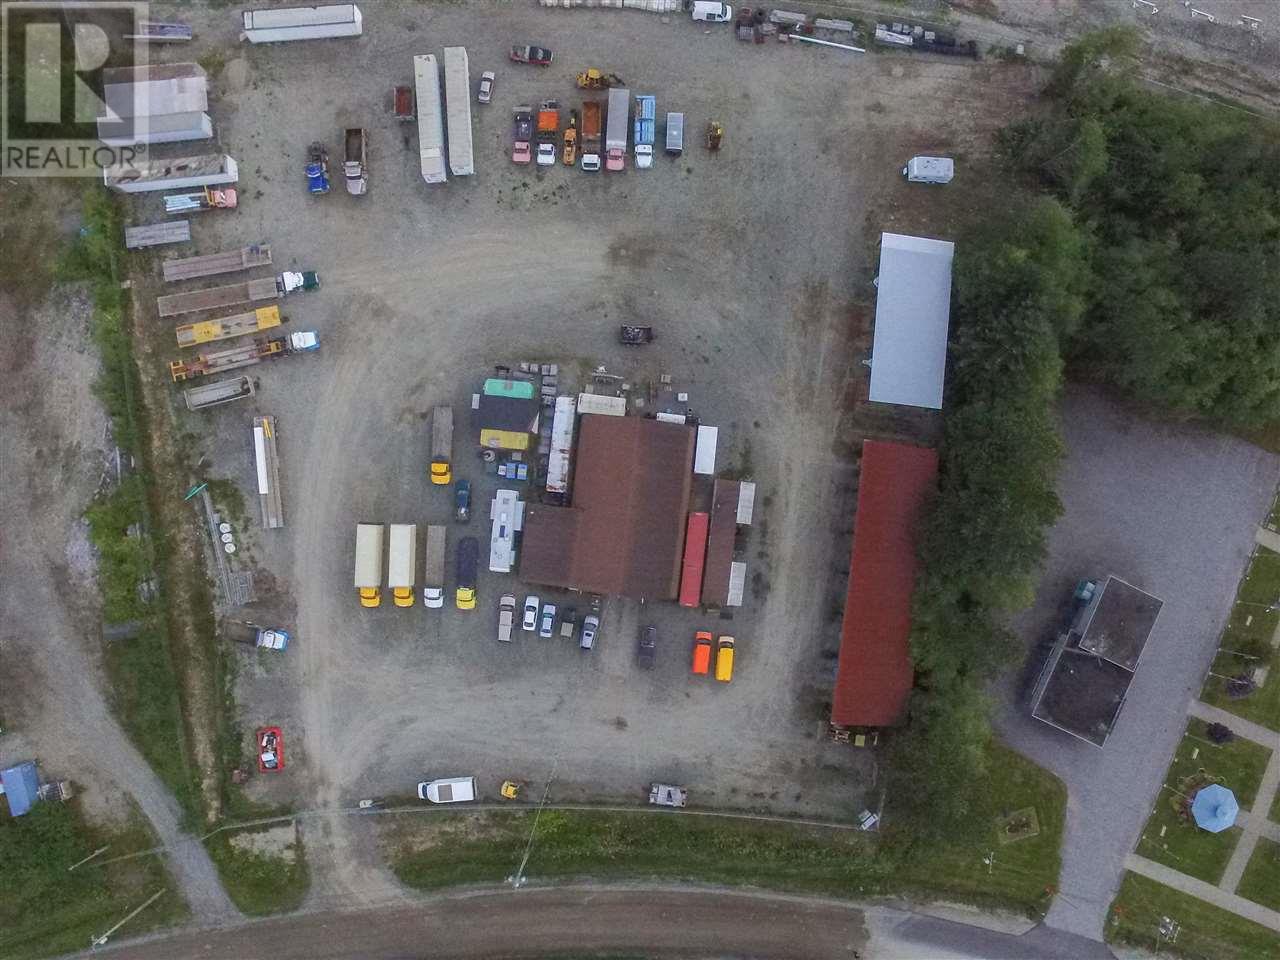 2131 FOREST AVENUE, kitimat (zone 89), British Columbia